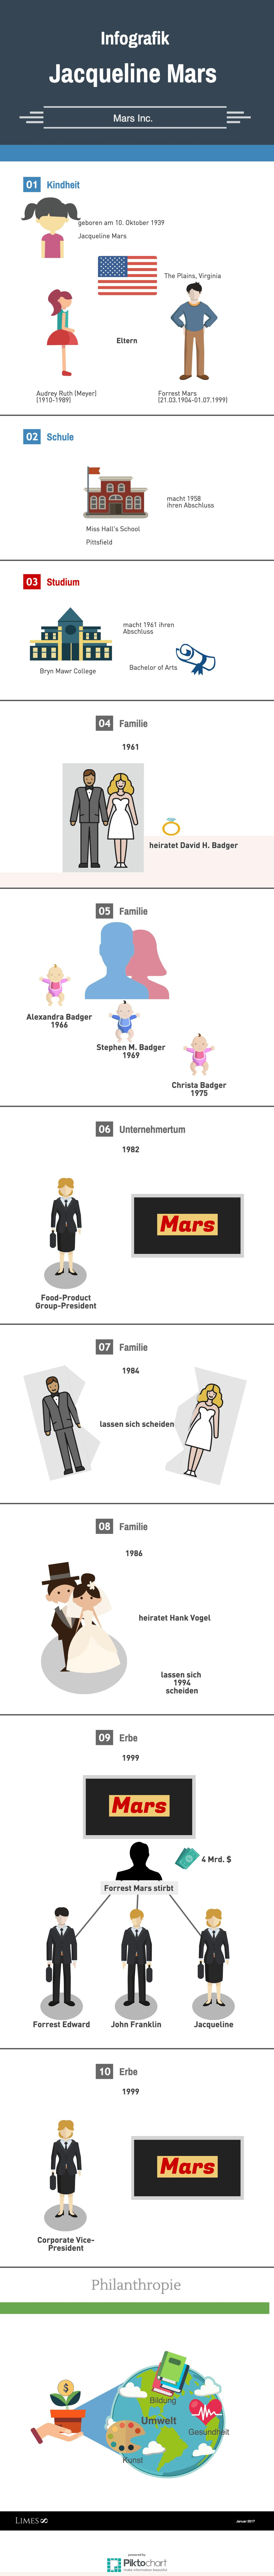 Informationsgrafik der Milliardärin Jaqueline Mars